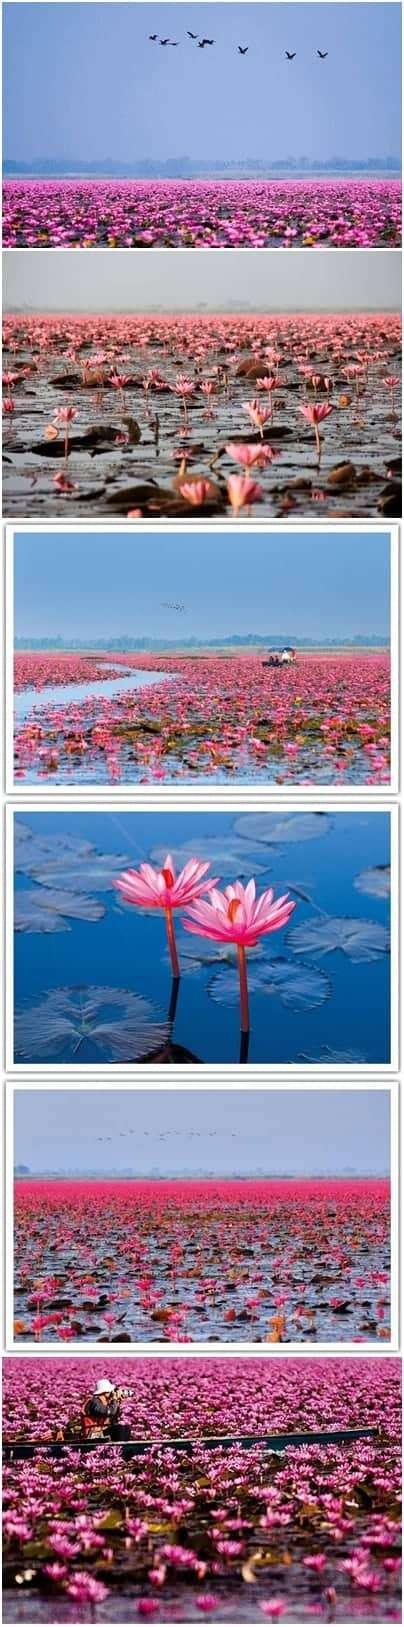 NongHan-Thailand-Red-Lotus-Lake